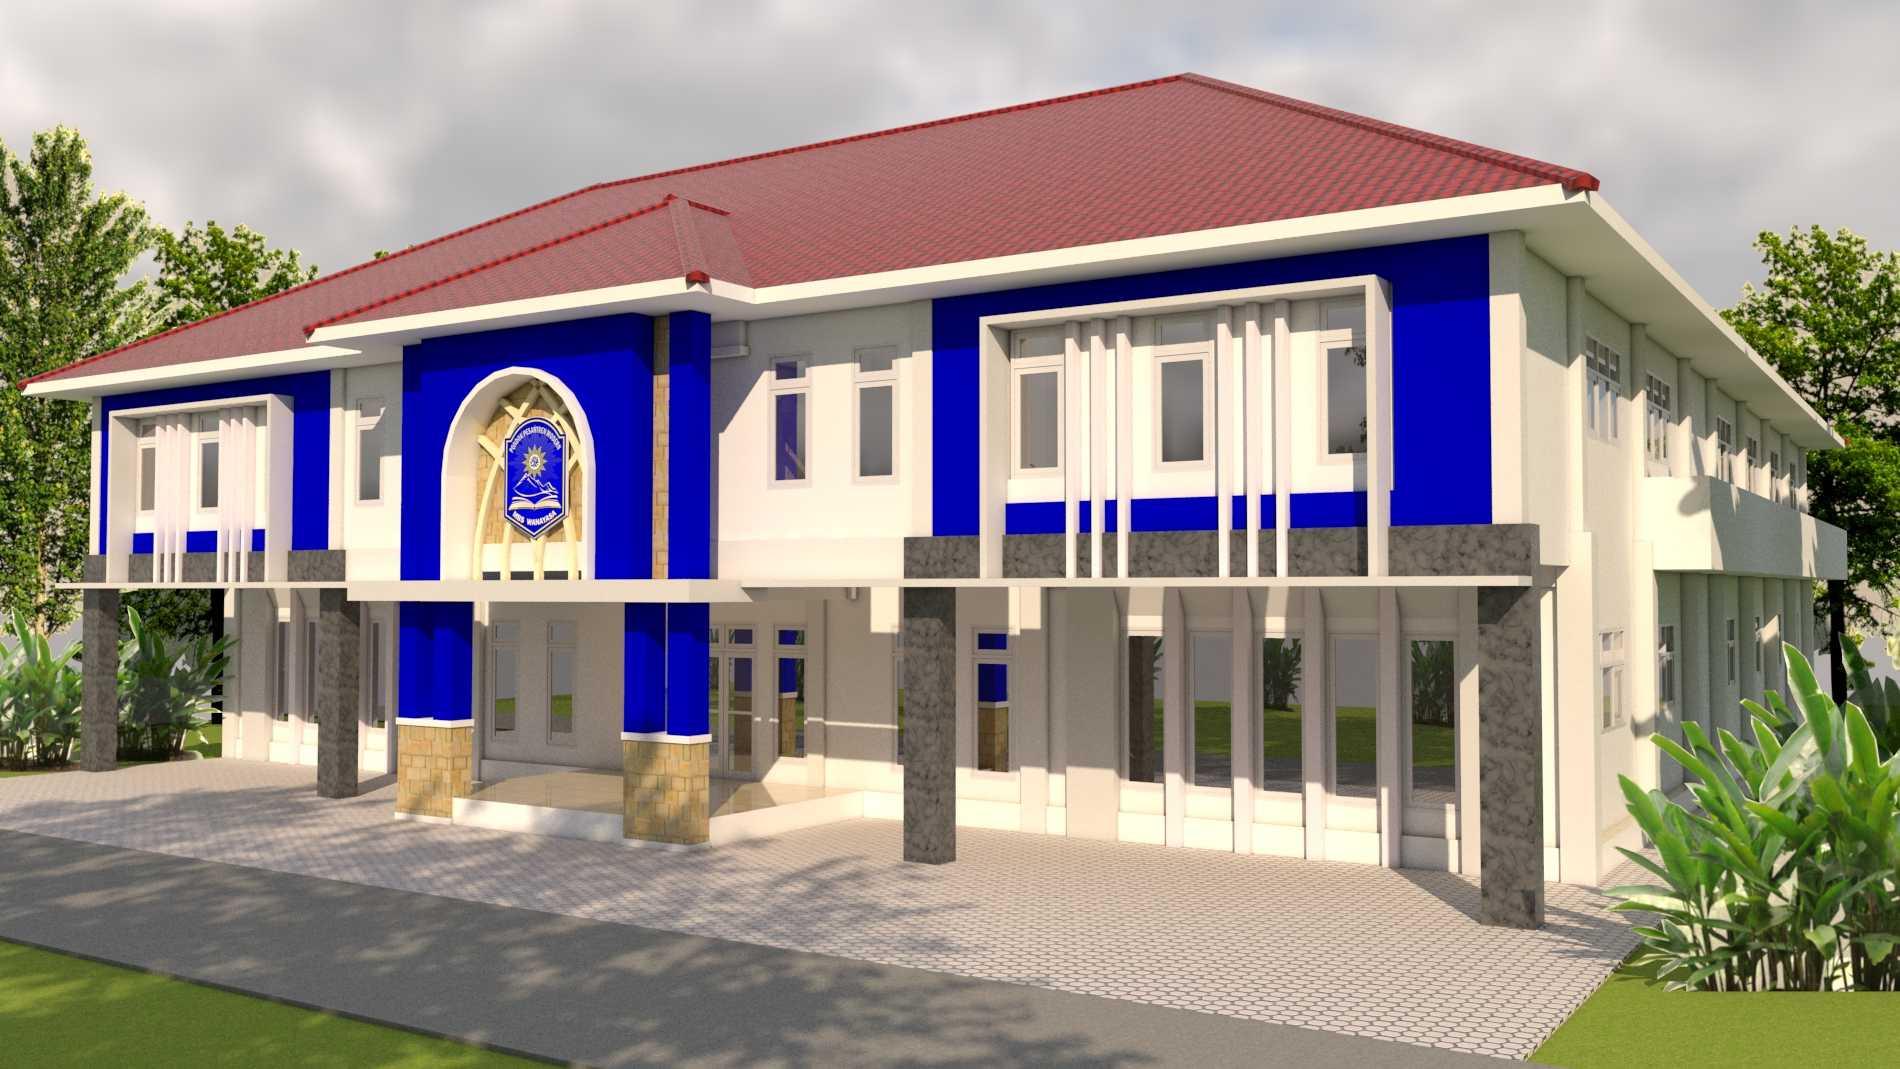 Emaaz Desain Muhammadiyah Boarding School (Mbs) Wanayasa, Banjarnegara Wanayasa, Banjarnegara, Jawa Tengah, Indonesia Wanayasa, Banjarnegara, Jawa Tengah, Indonesia Emaaz-Desain-Muhammadiyah-Boarding-School-Mbs-Wanayasa-Banjarnegara   128272